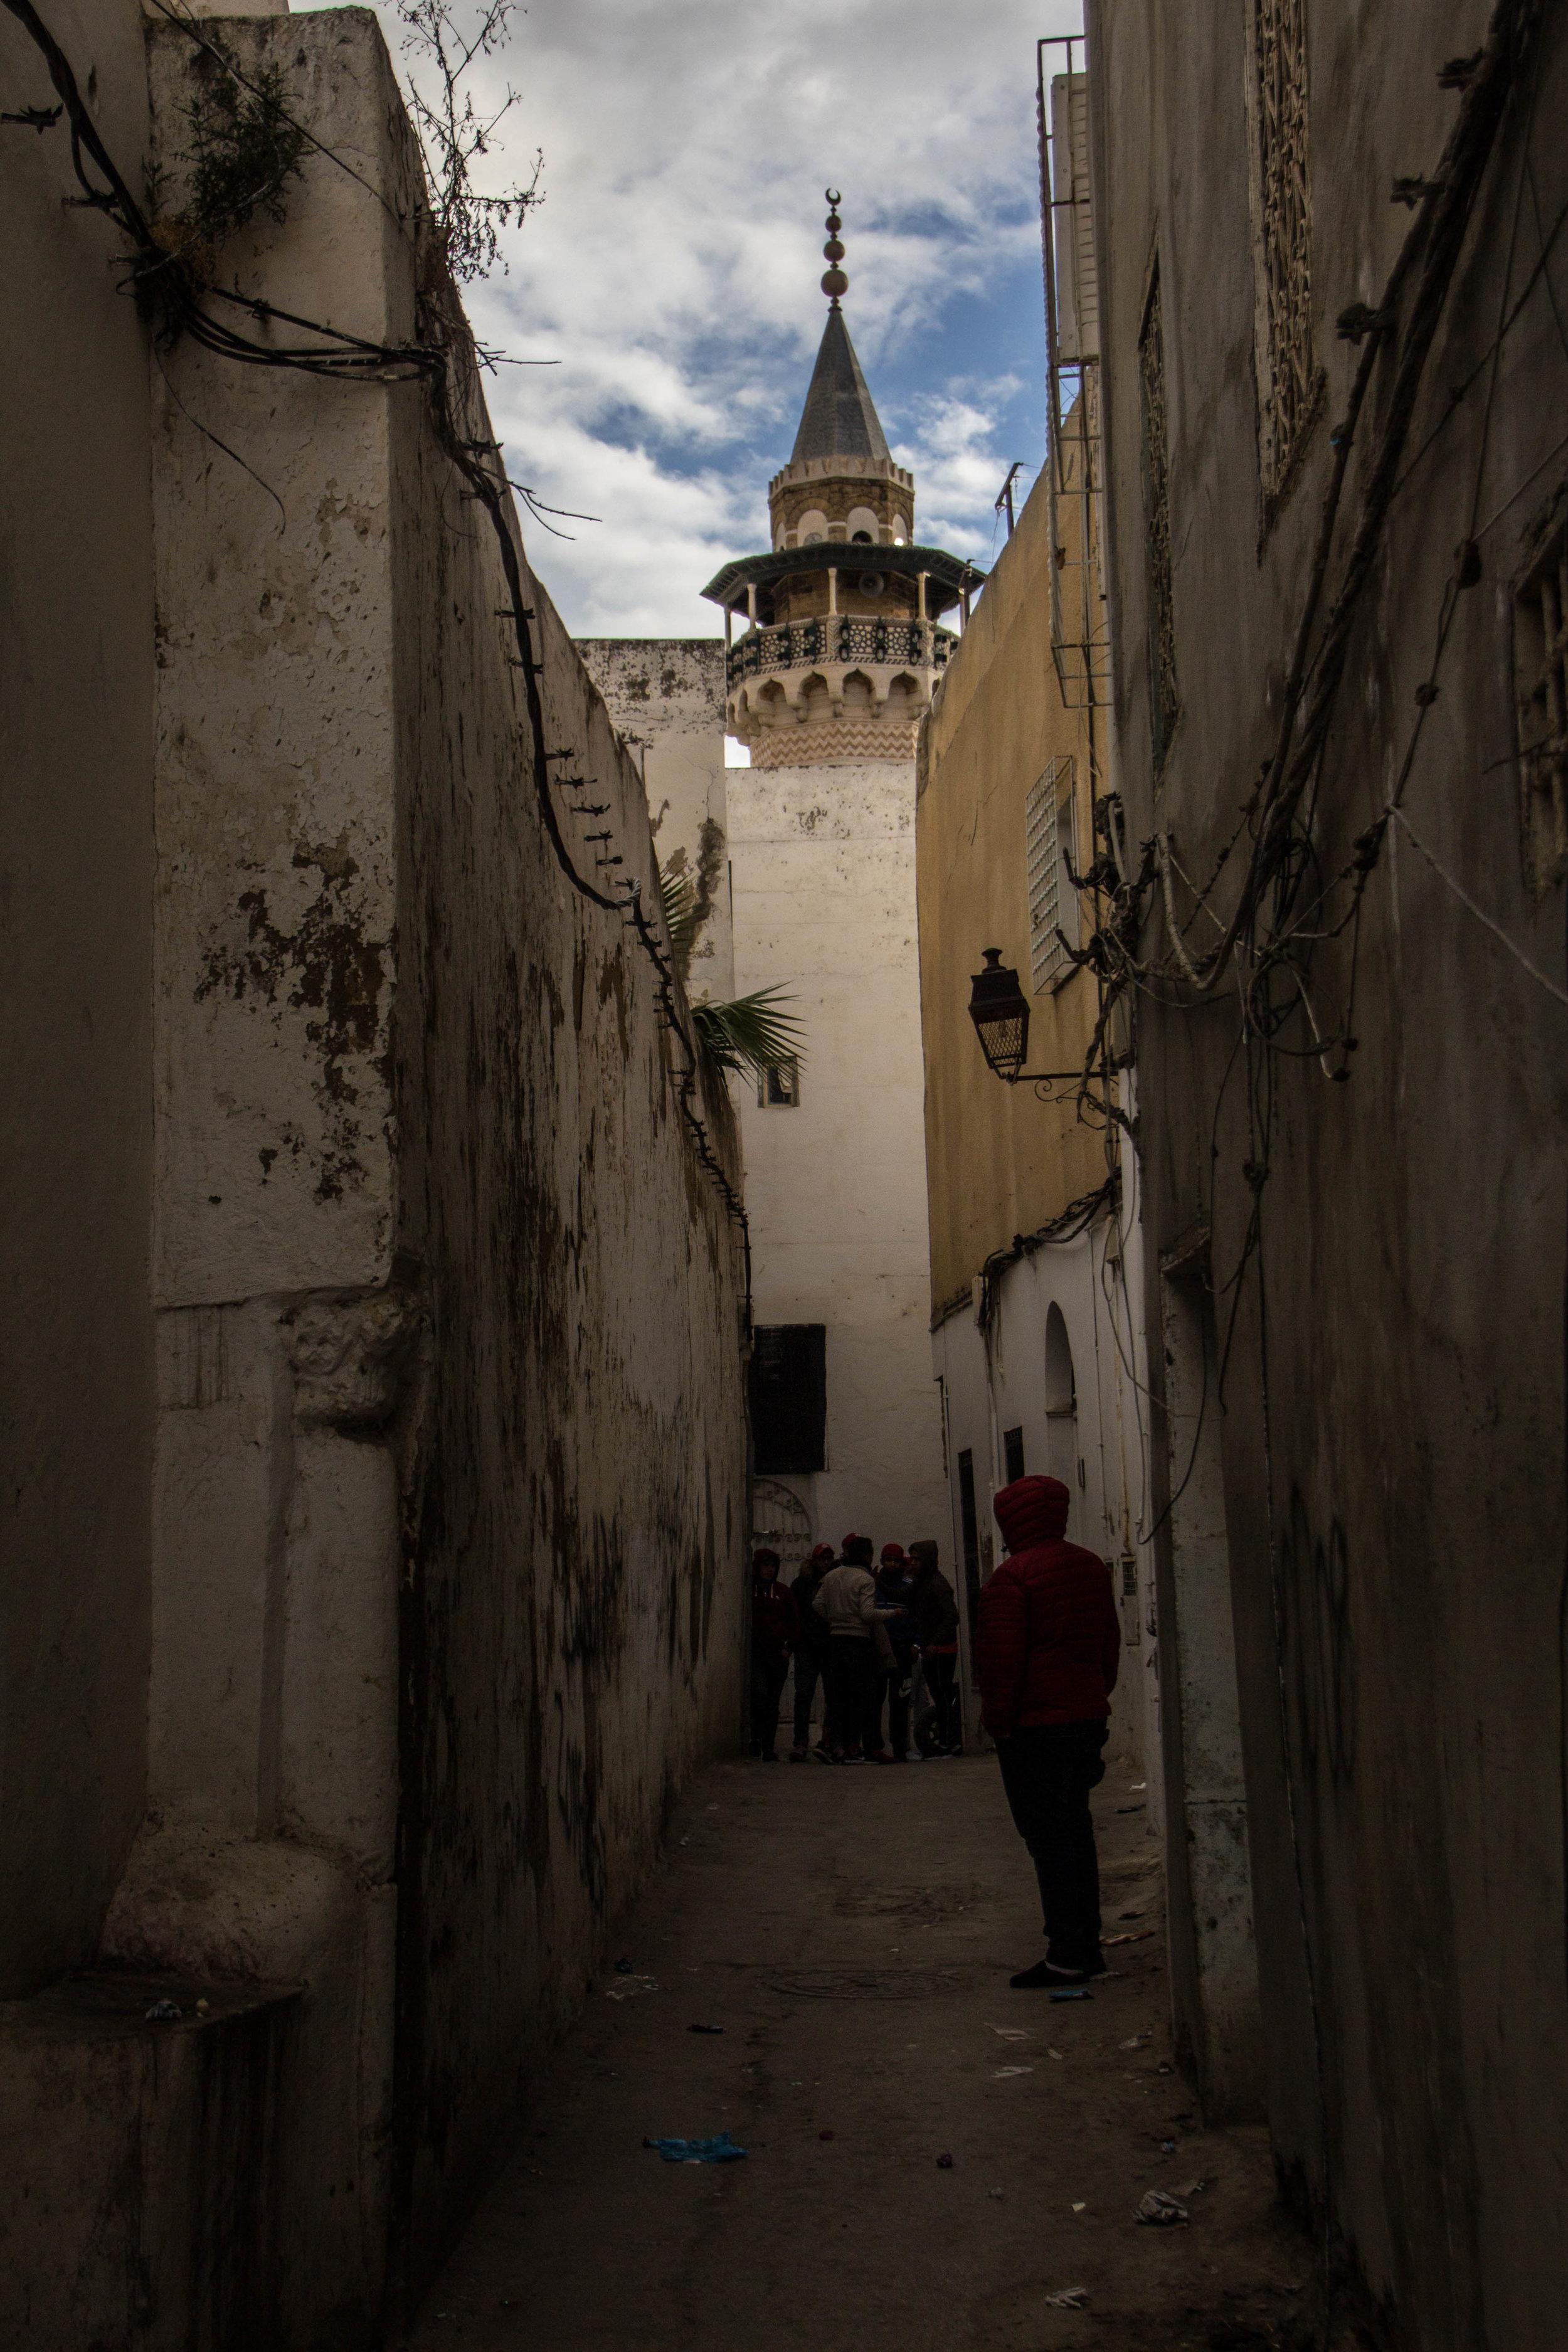 medina-photography-tunis-tunisia-23.jpg